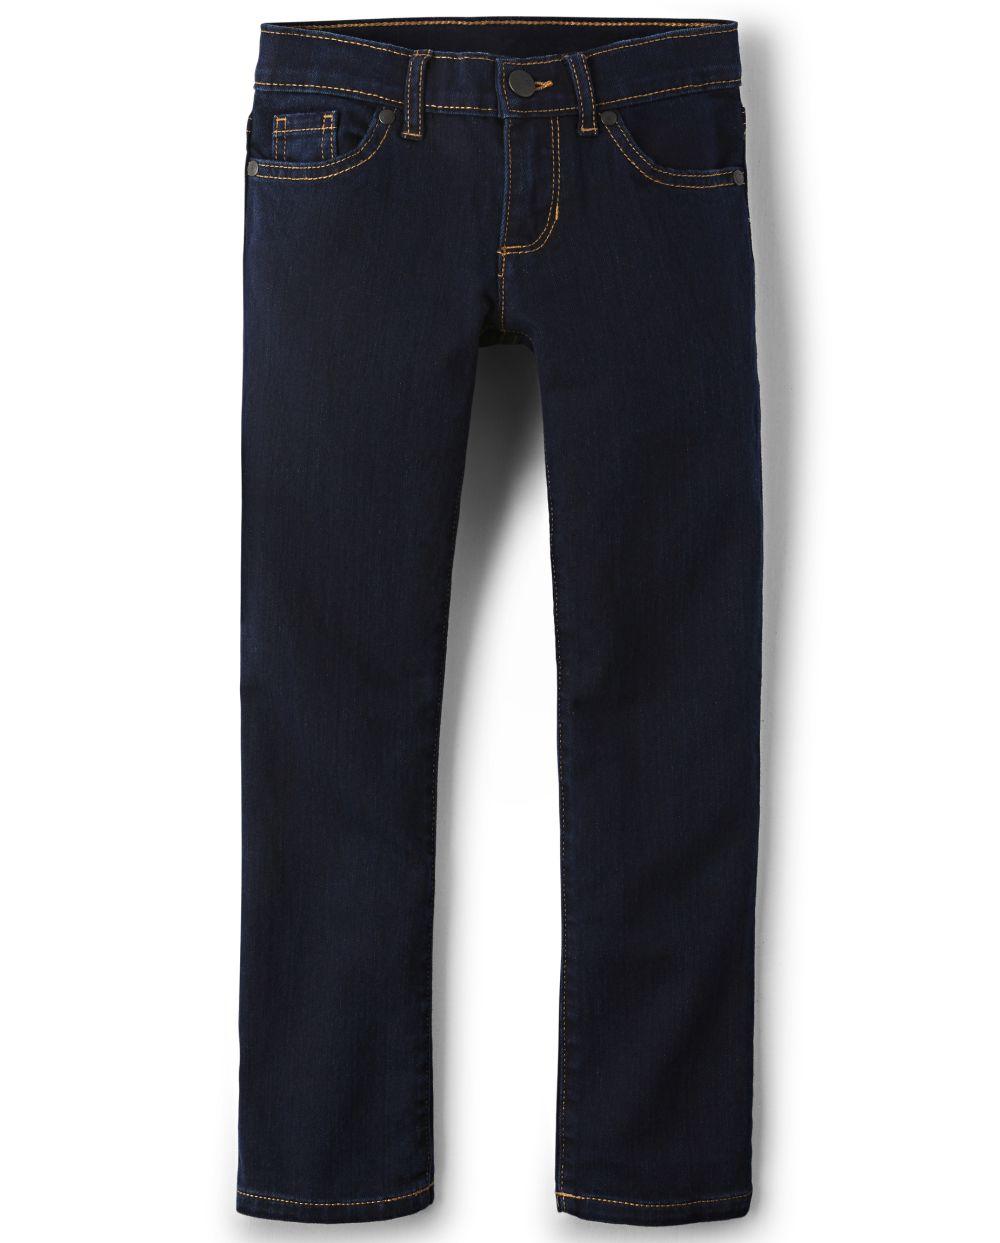 Discounts Girls Basic Skinny Jeans